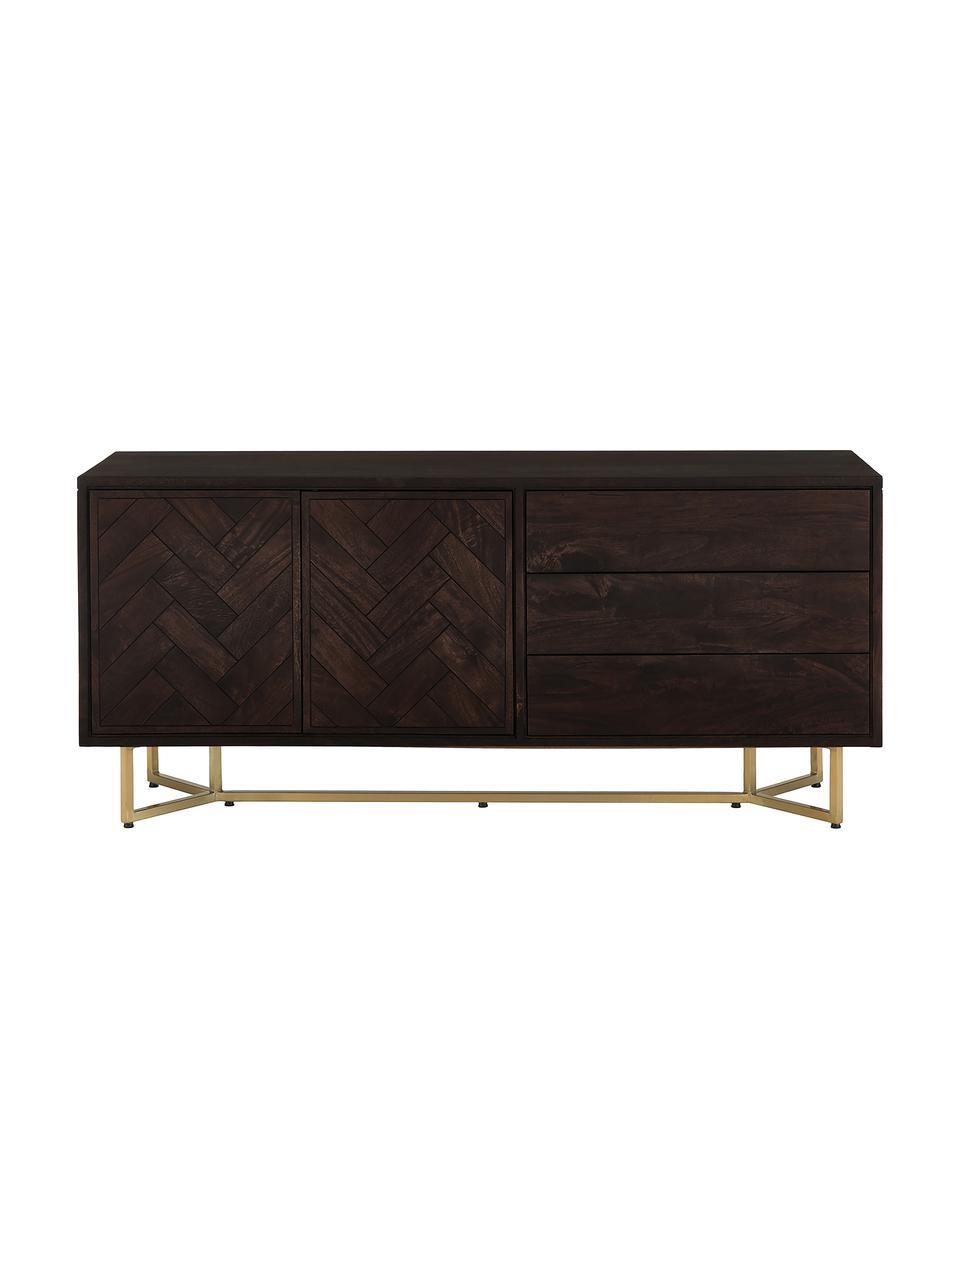 Visgraat dressoir Luca met deuren van massief hout, Frame: massief mangohout, Frame: gecoat metaal, Donkerbruin, 160 x 70 cm